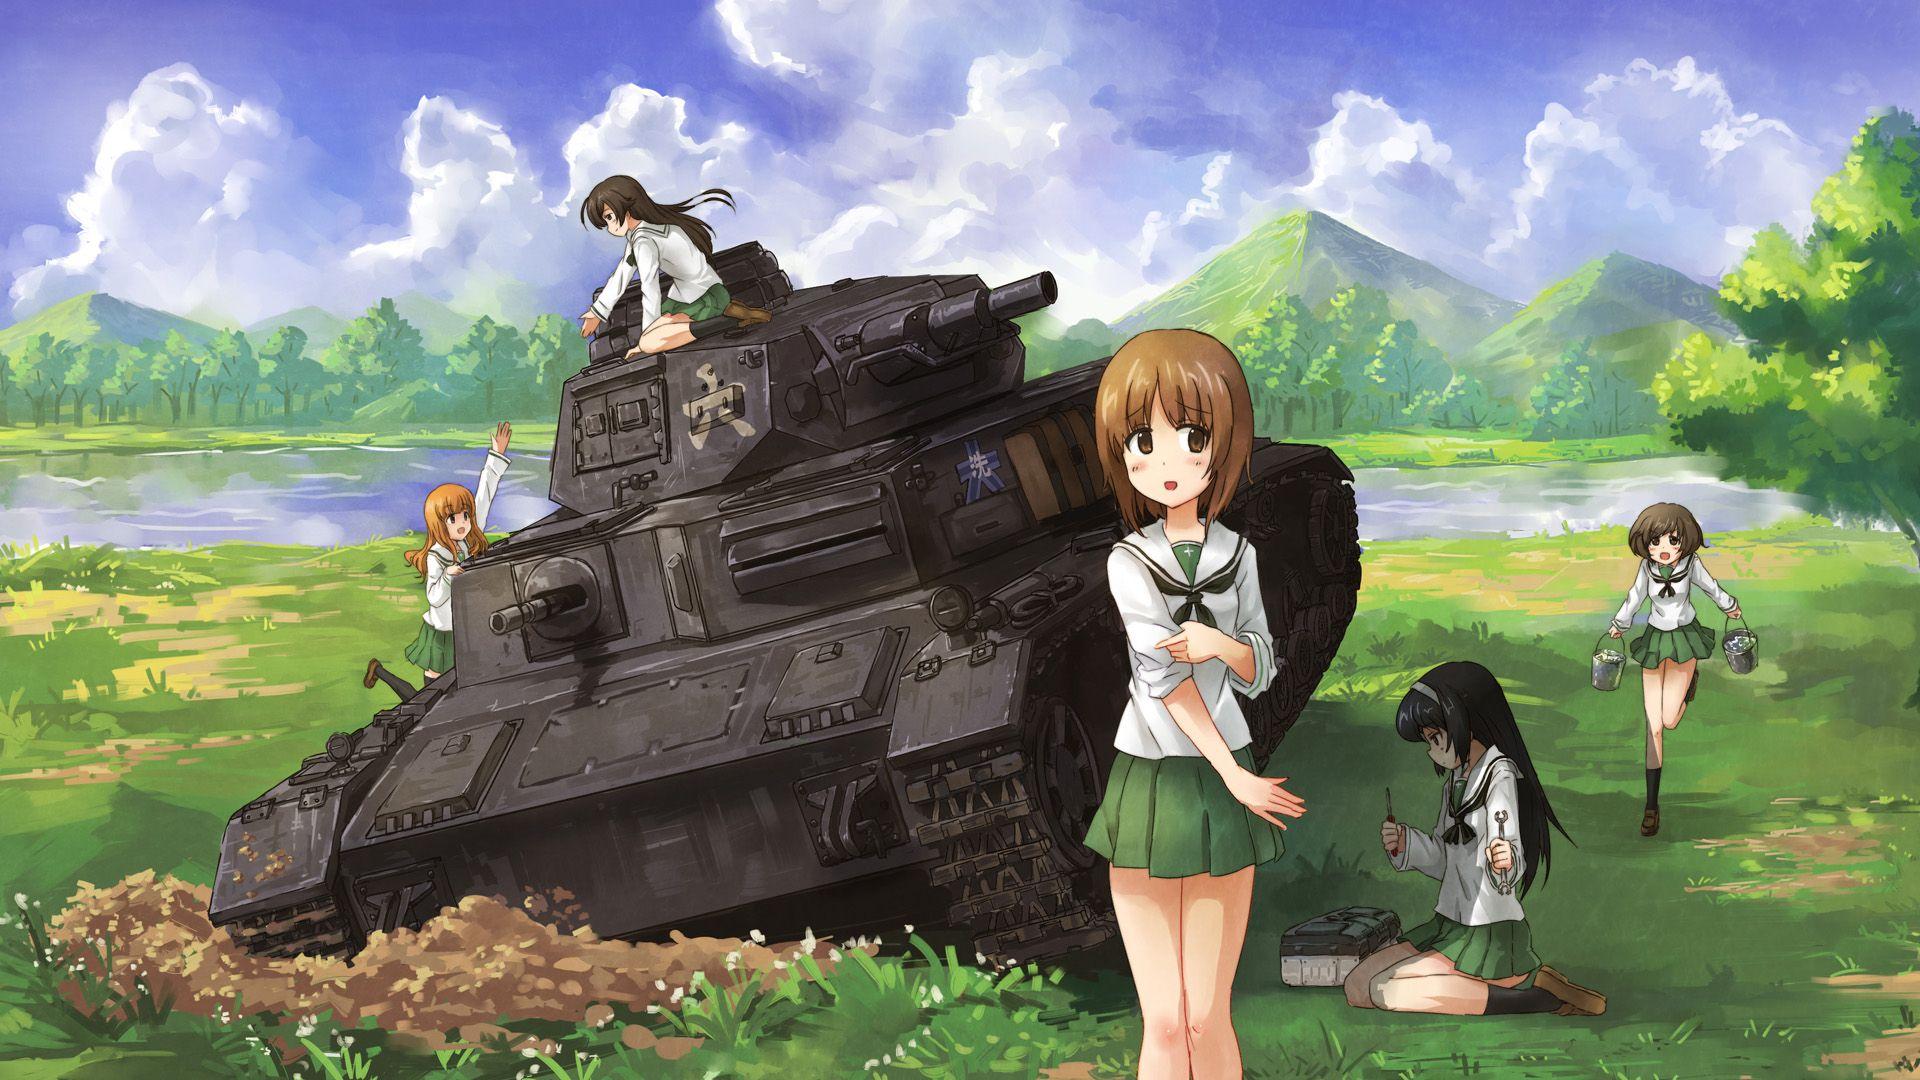 Preview Art 57510 1920x1080 Anime Girls Und Panzer In 2020 Anime Art Girl Anime Art Girl